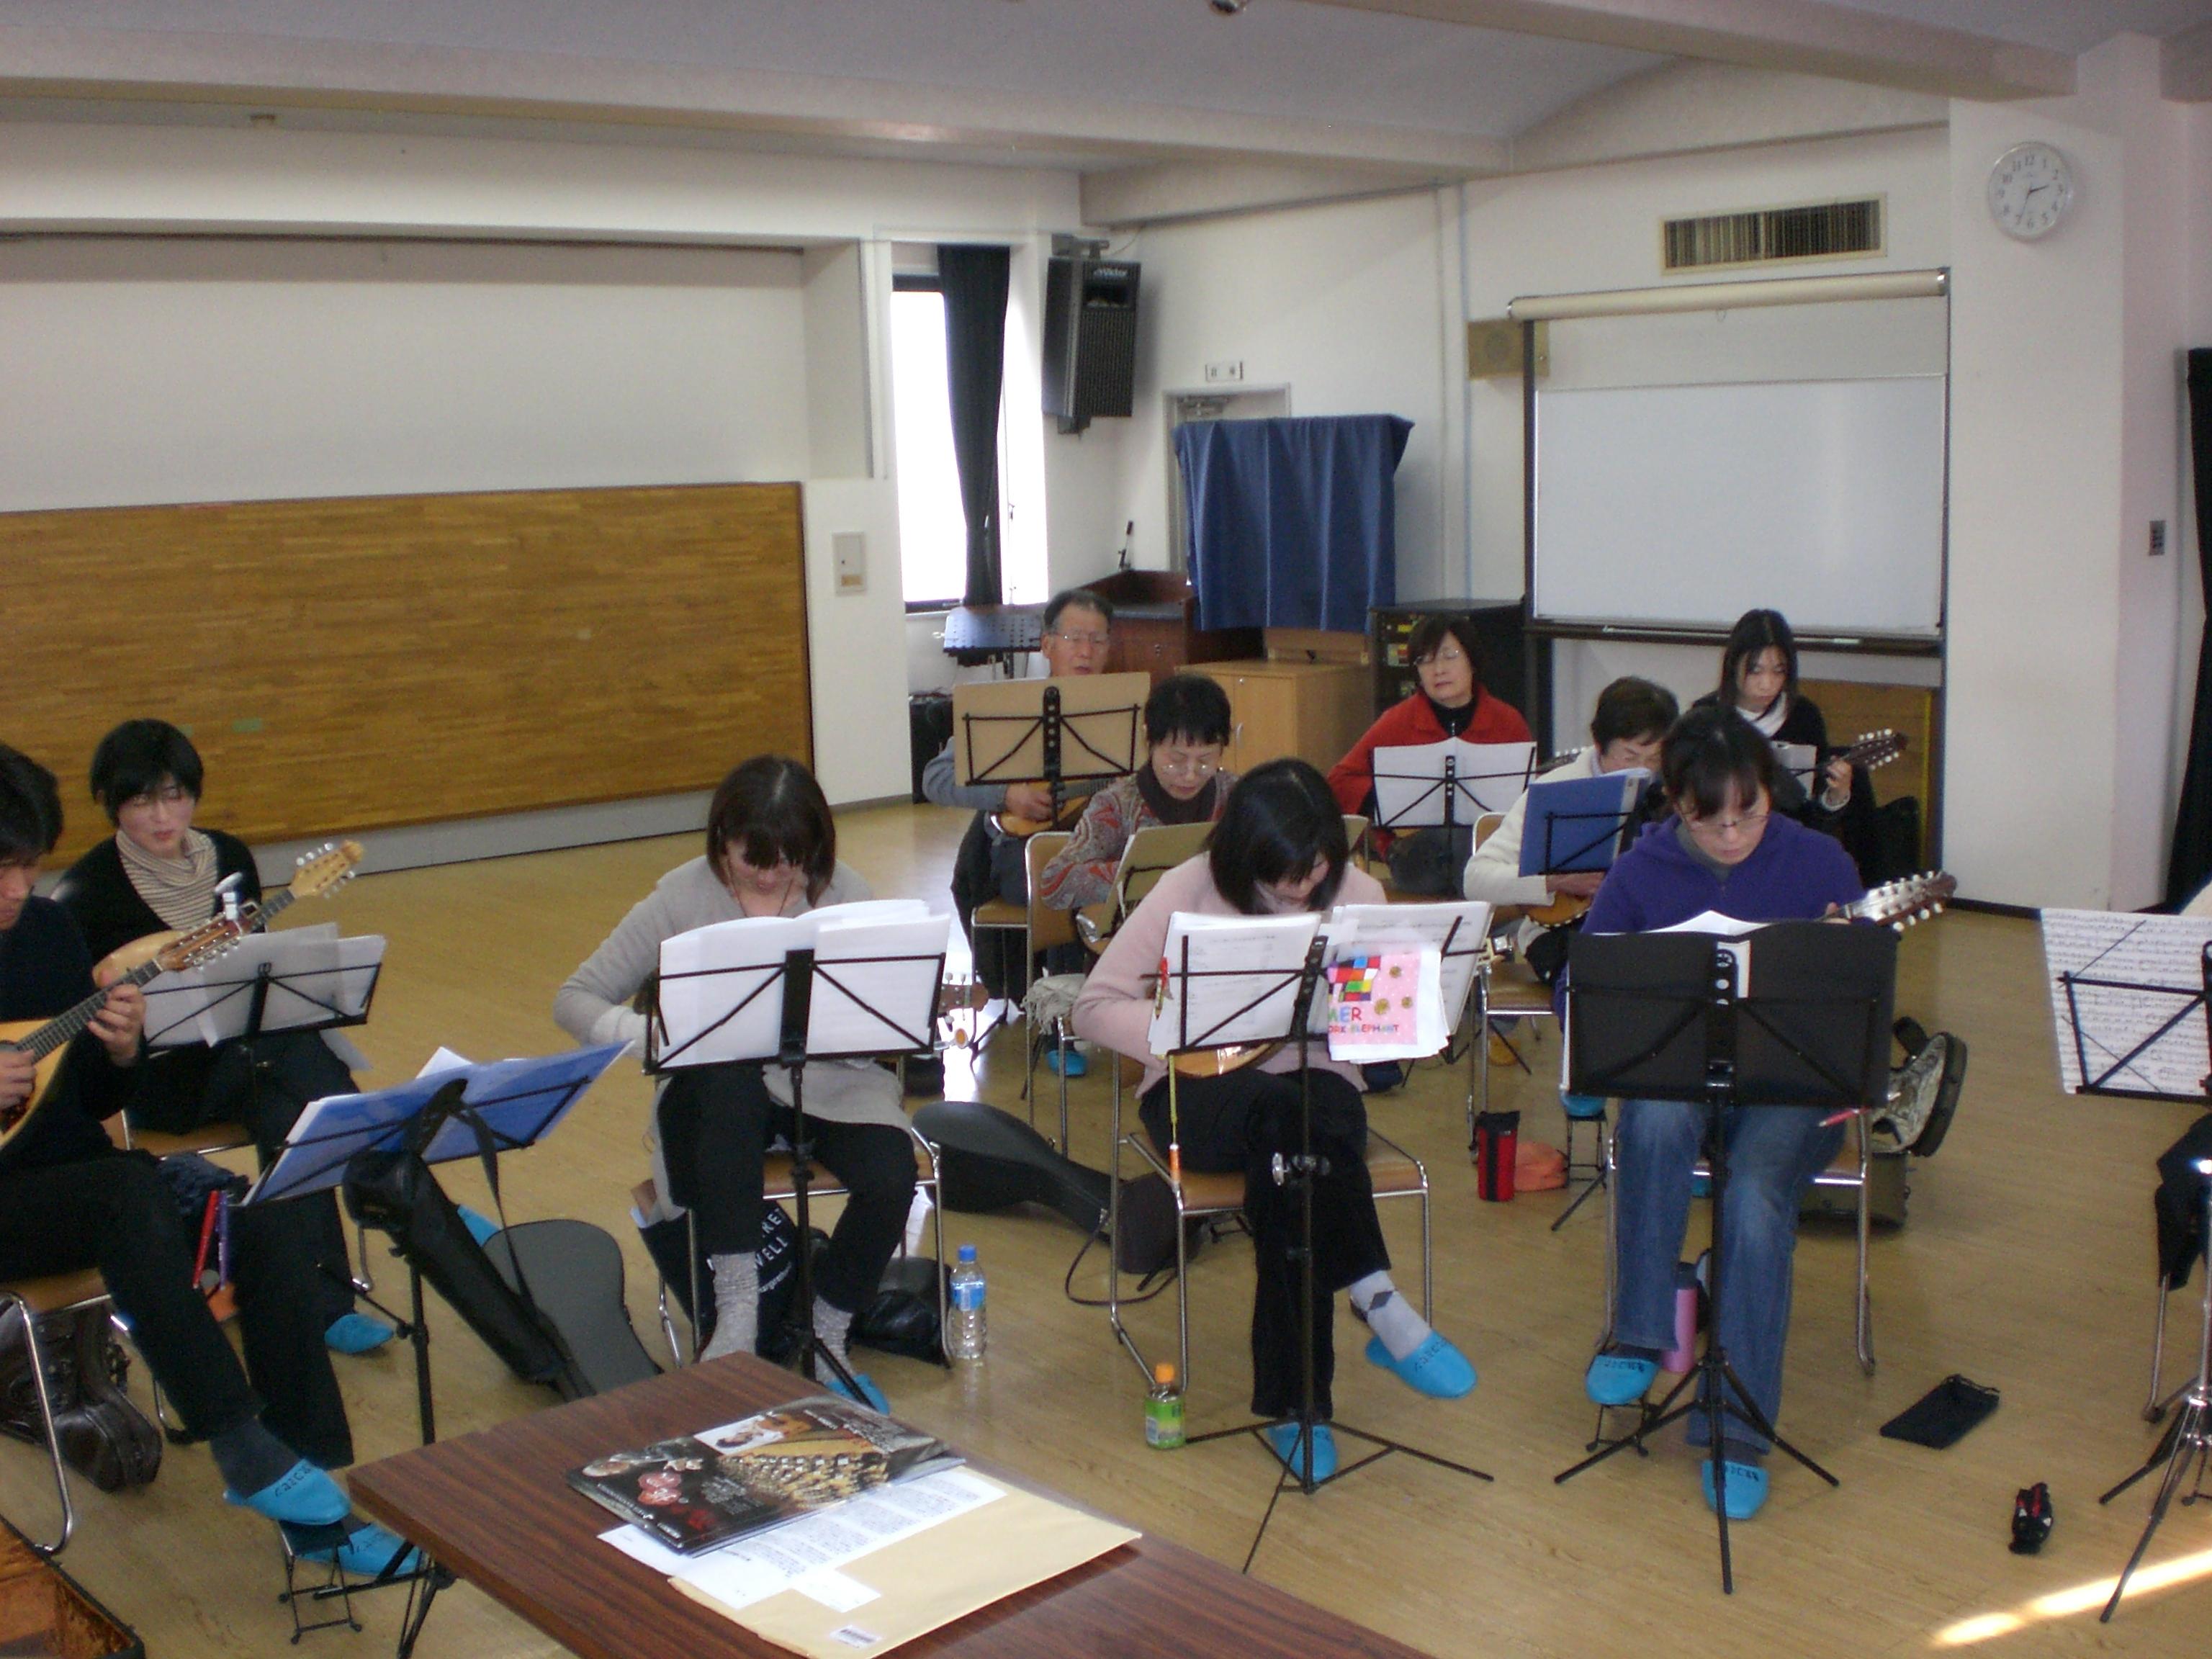 http://niizamandolinclub.jp/blog/CIMG1617.JPG